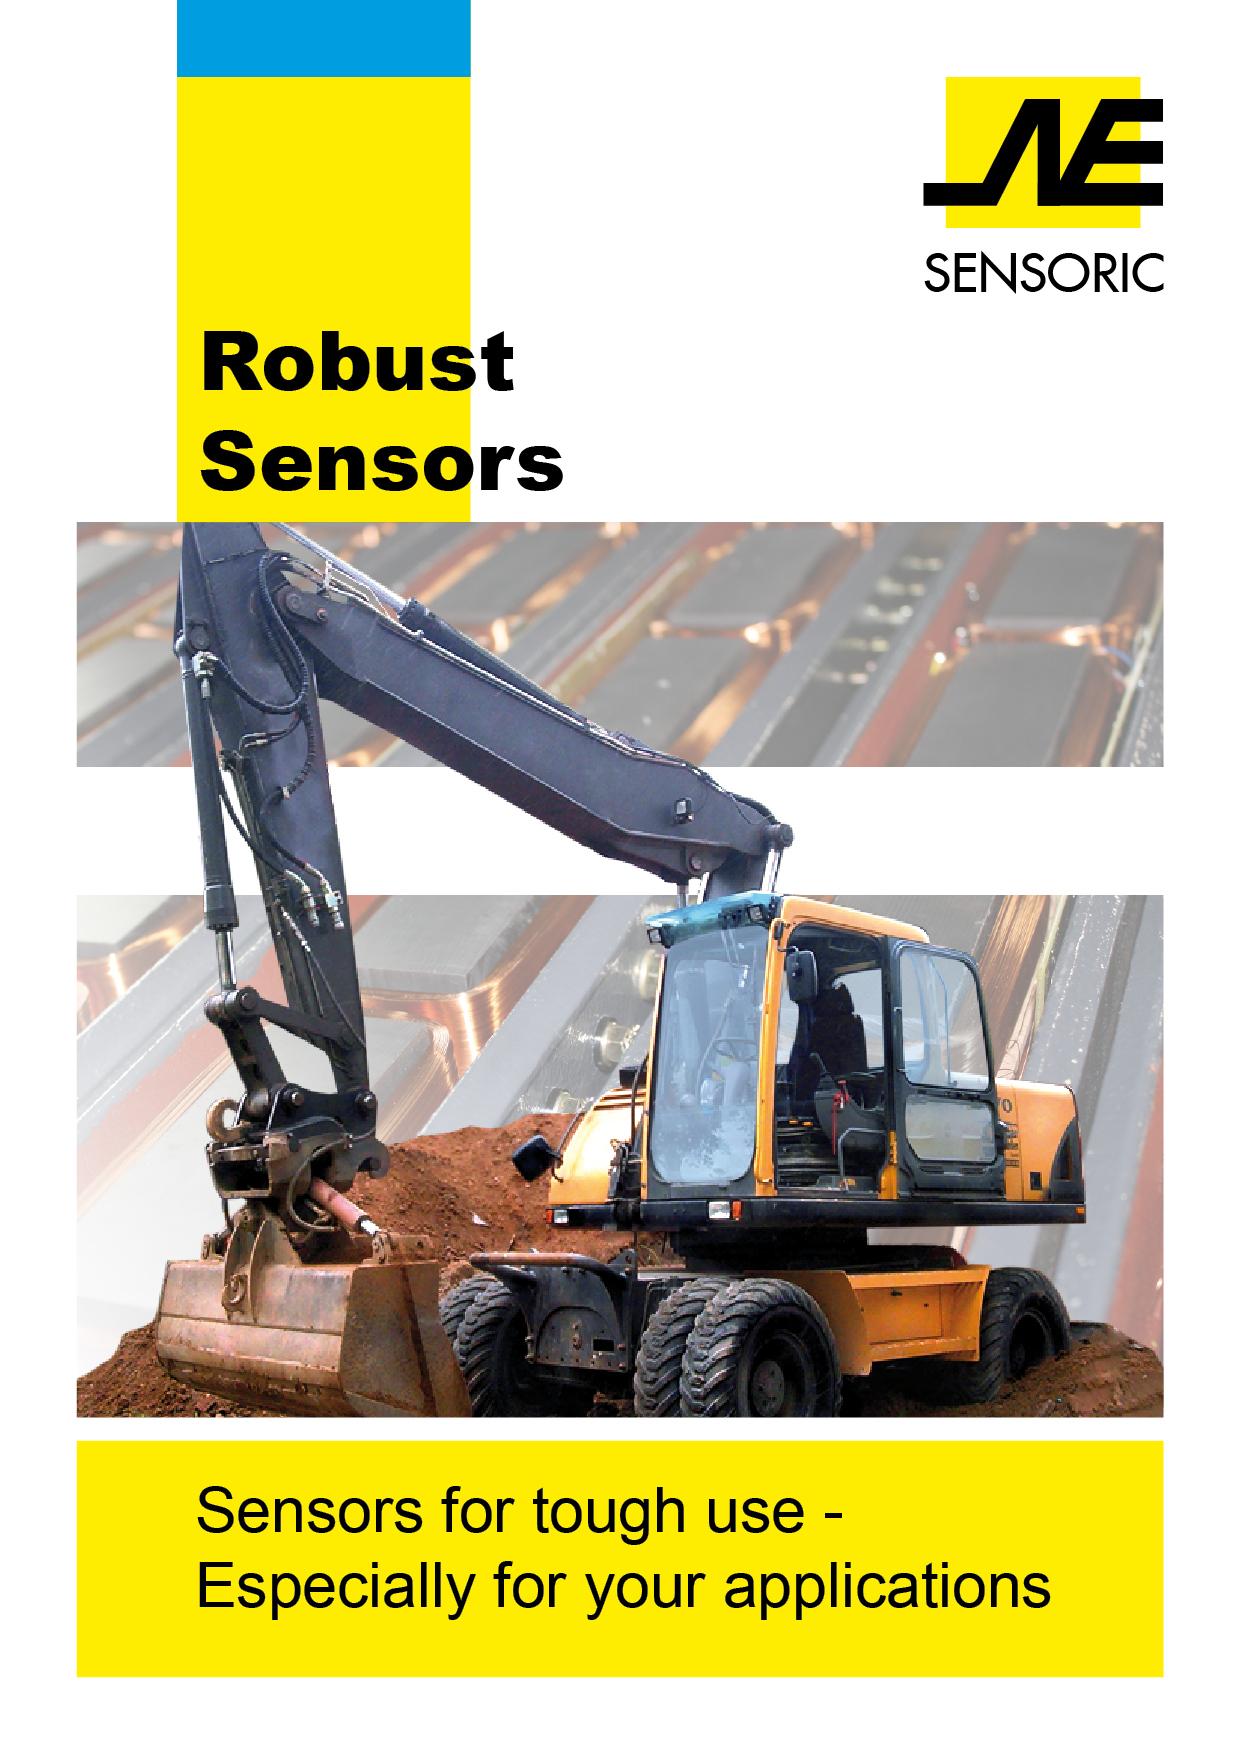 Robuste Sensoren